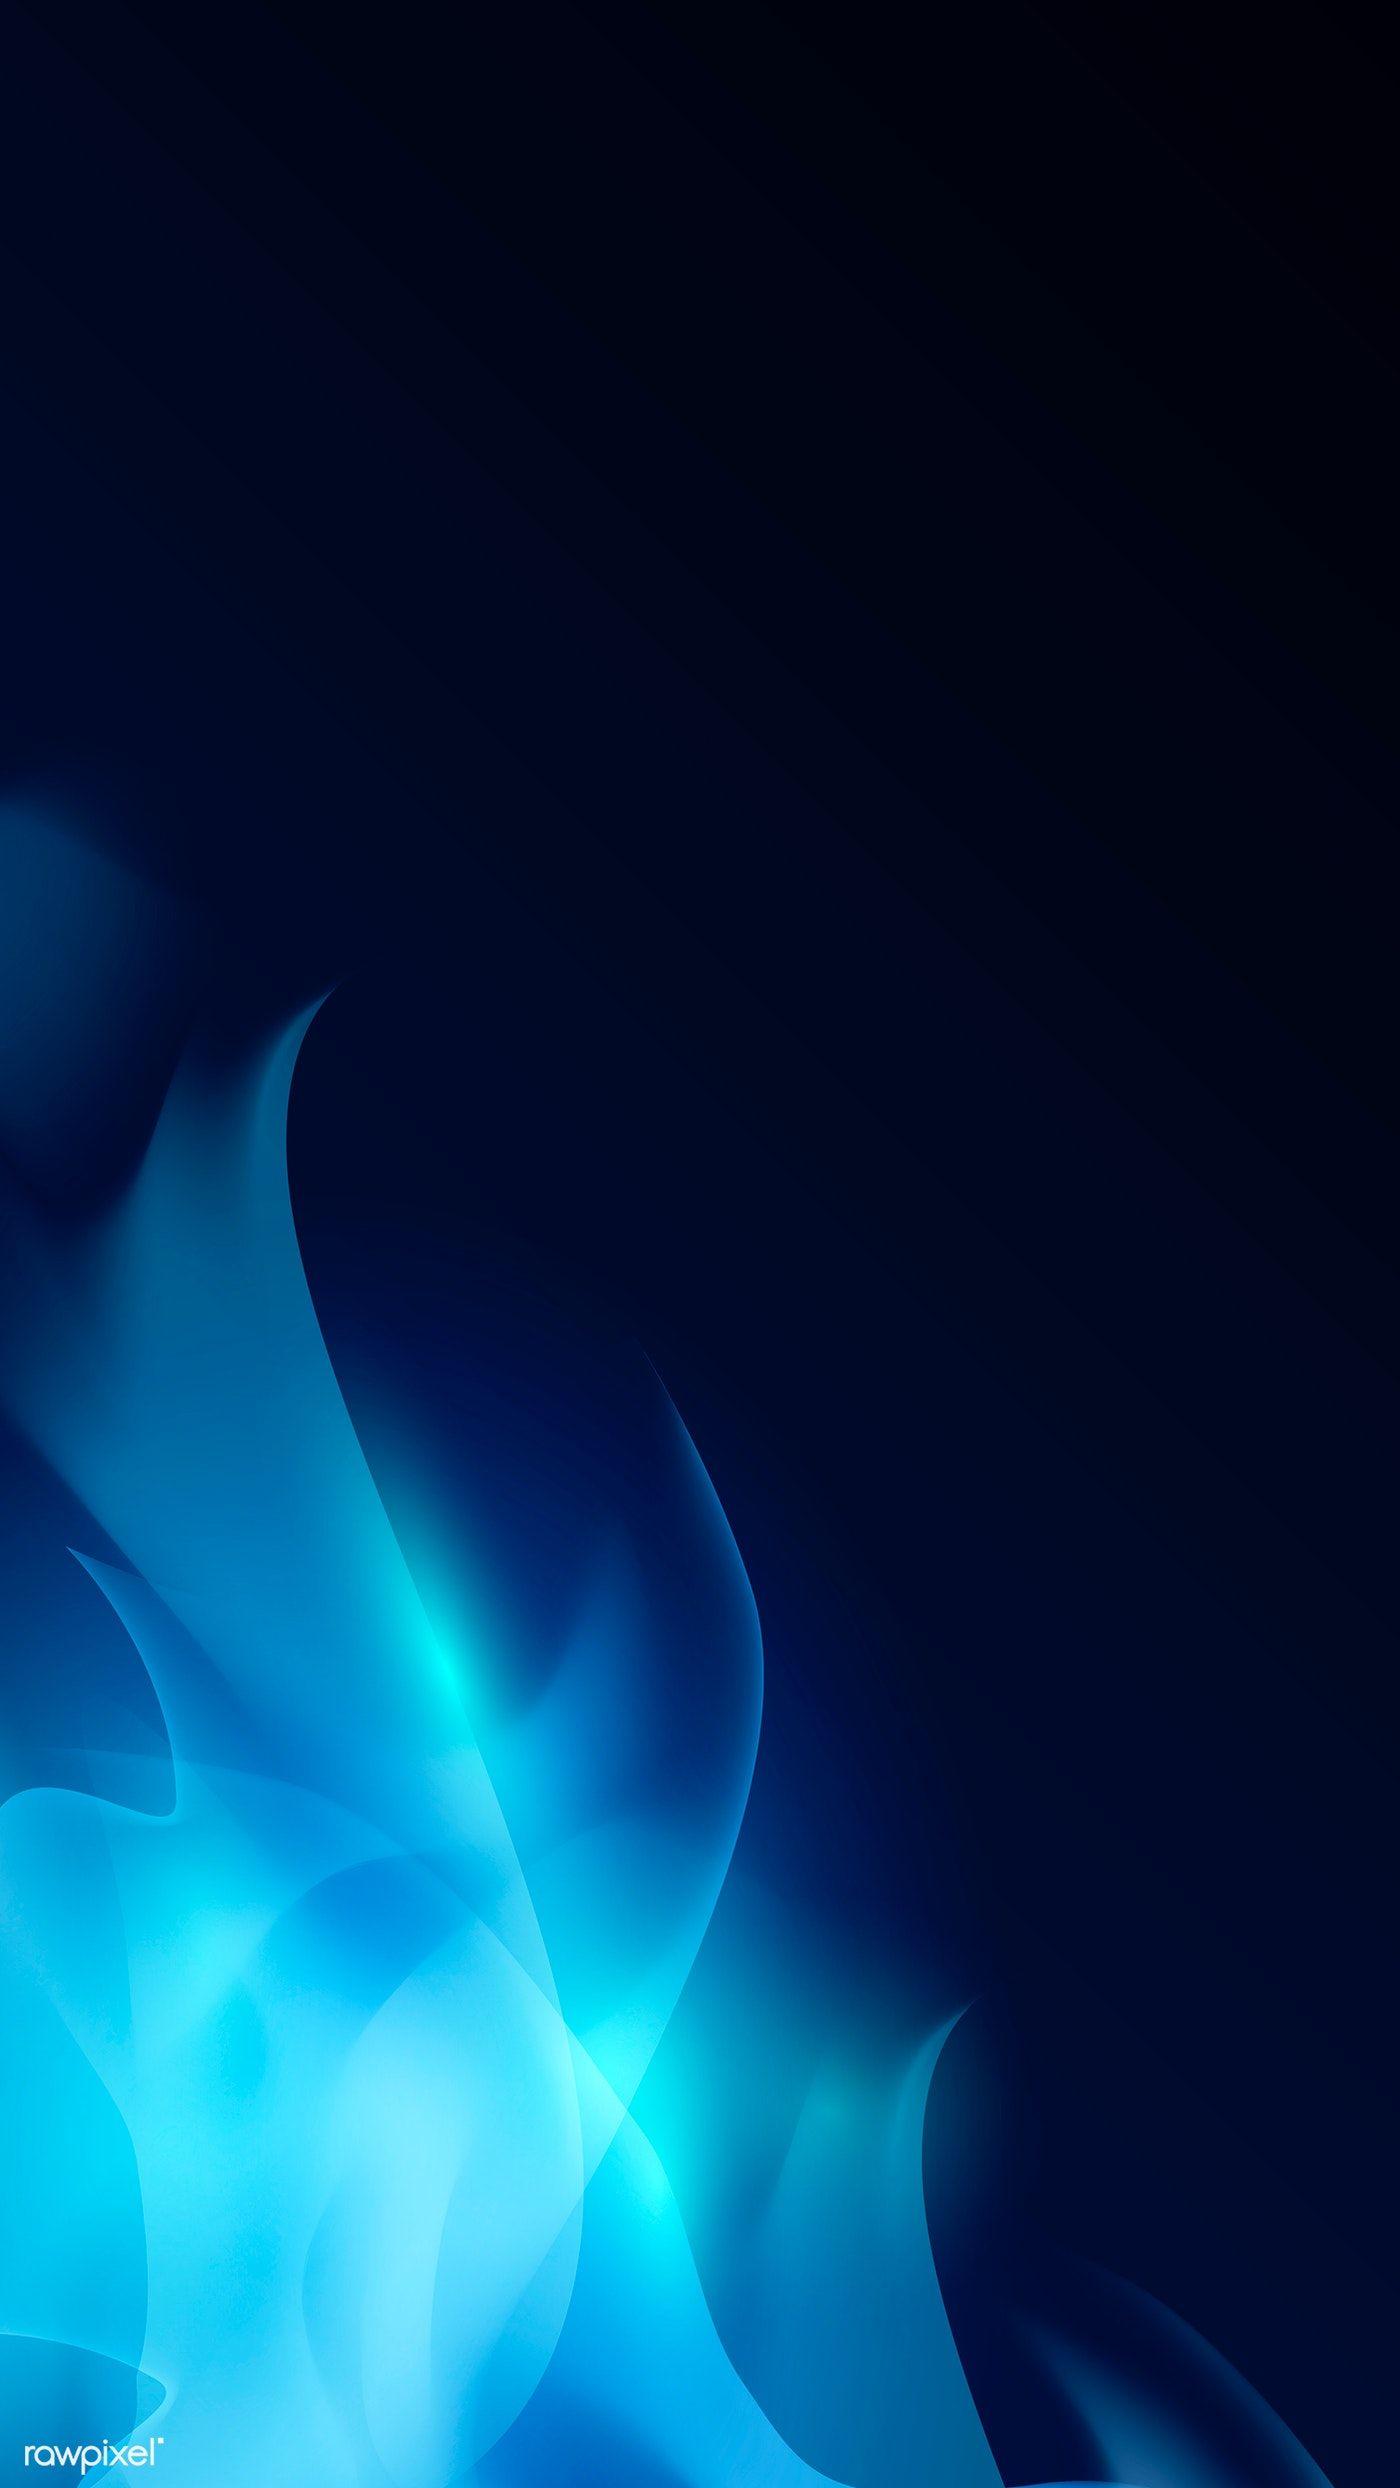 Blue 2 Blue Background Wallpapers Blue Background Images Blue Backgrounds